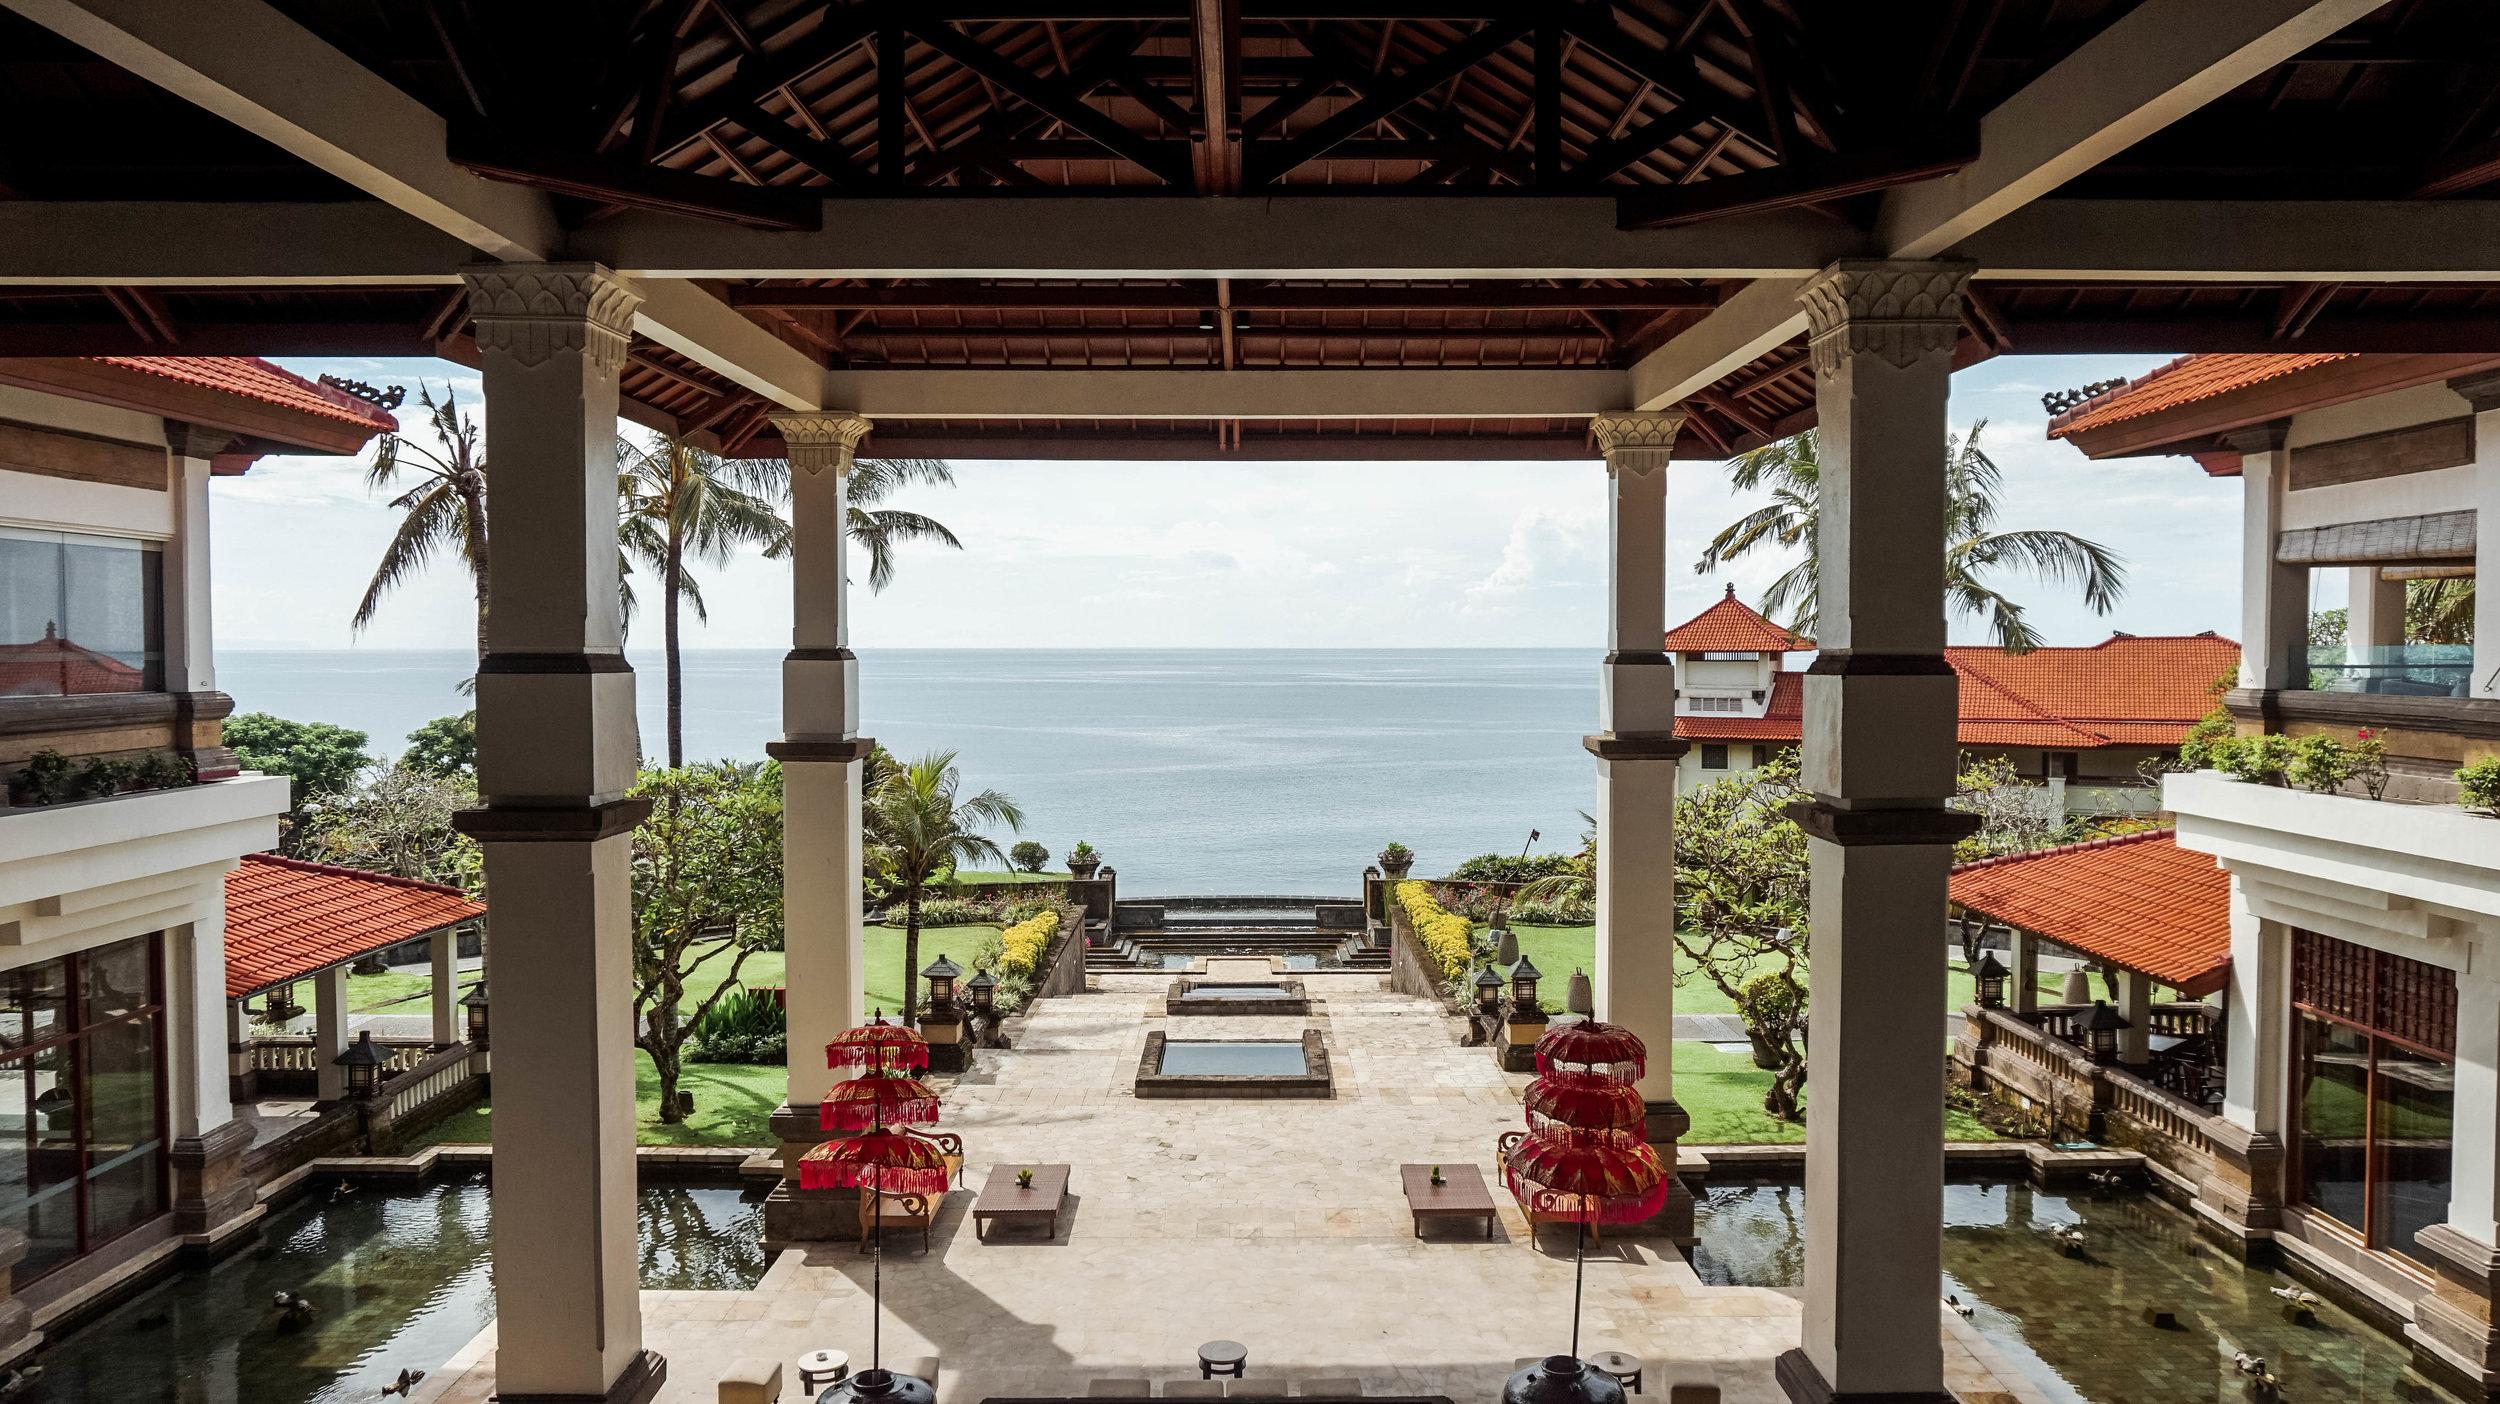 Hilton-bali-resort-reception-2018.jpg